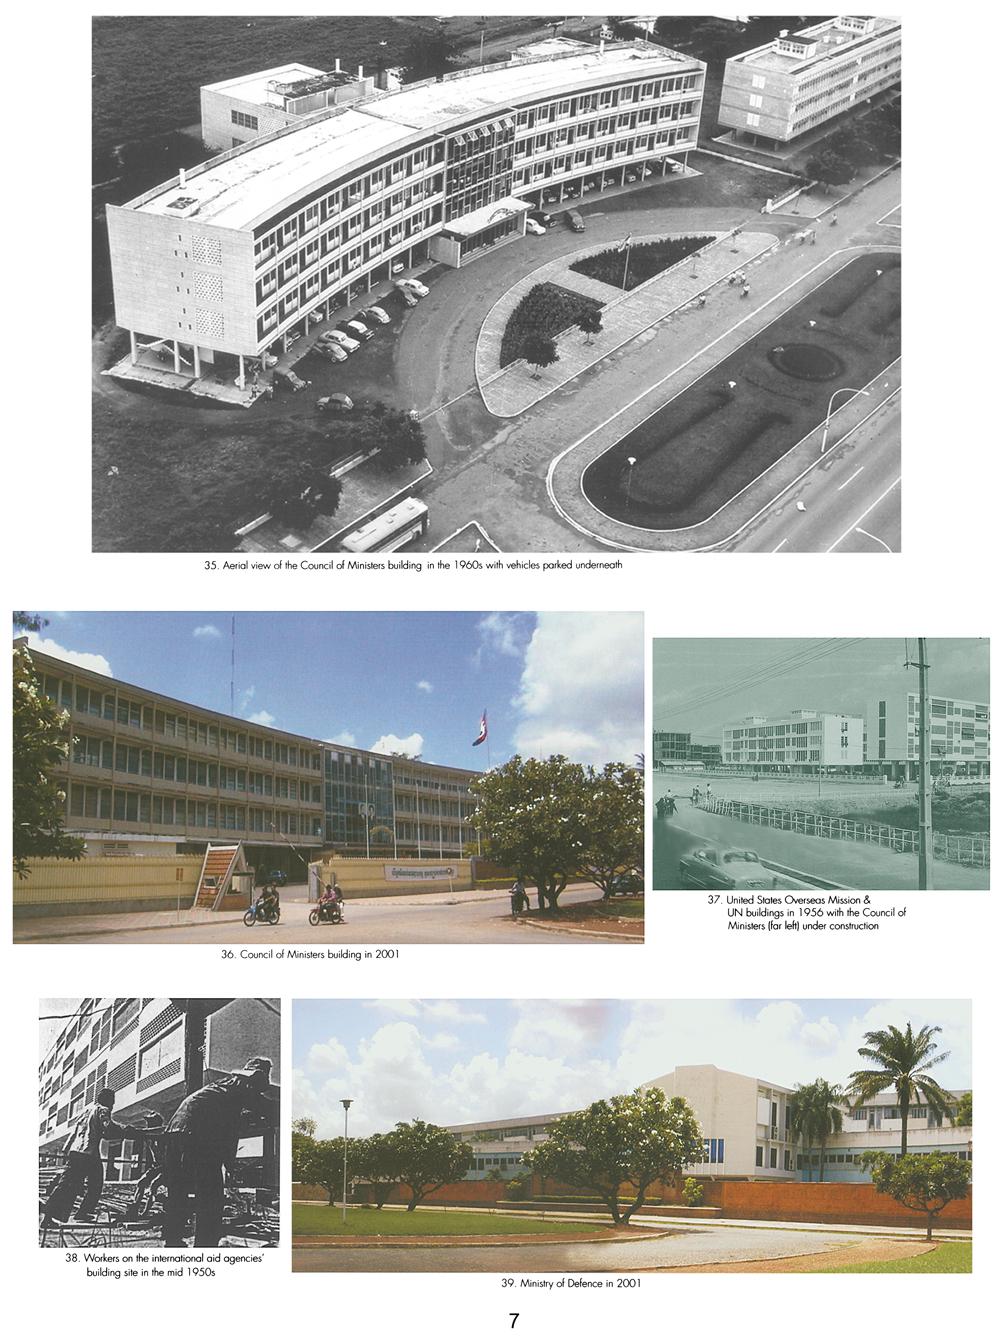 All/document/Documents/BuildingCambodia/BuildingCambodia/id667/photo007.jpg